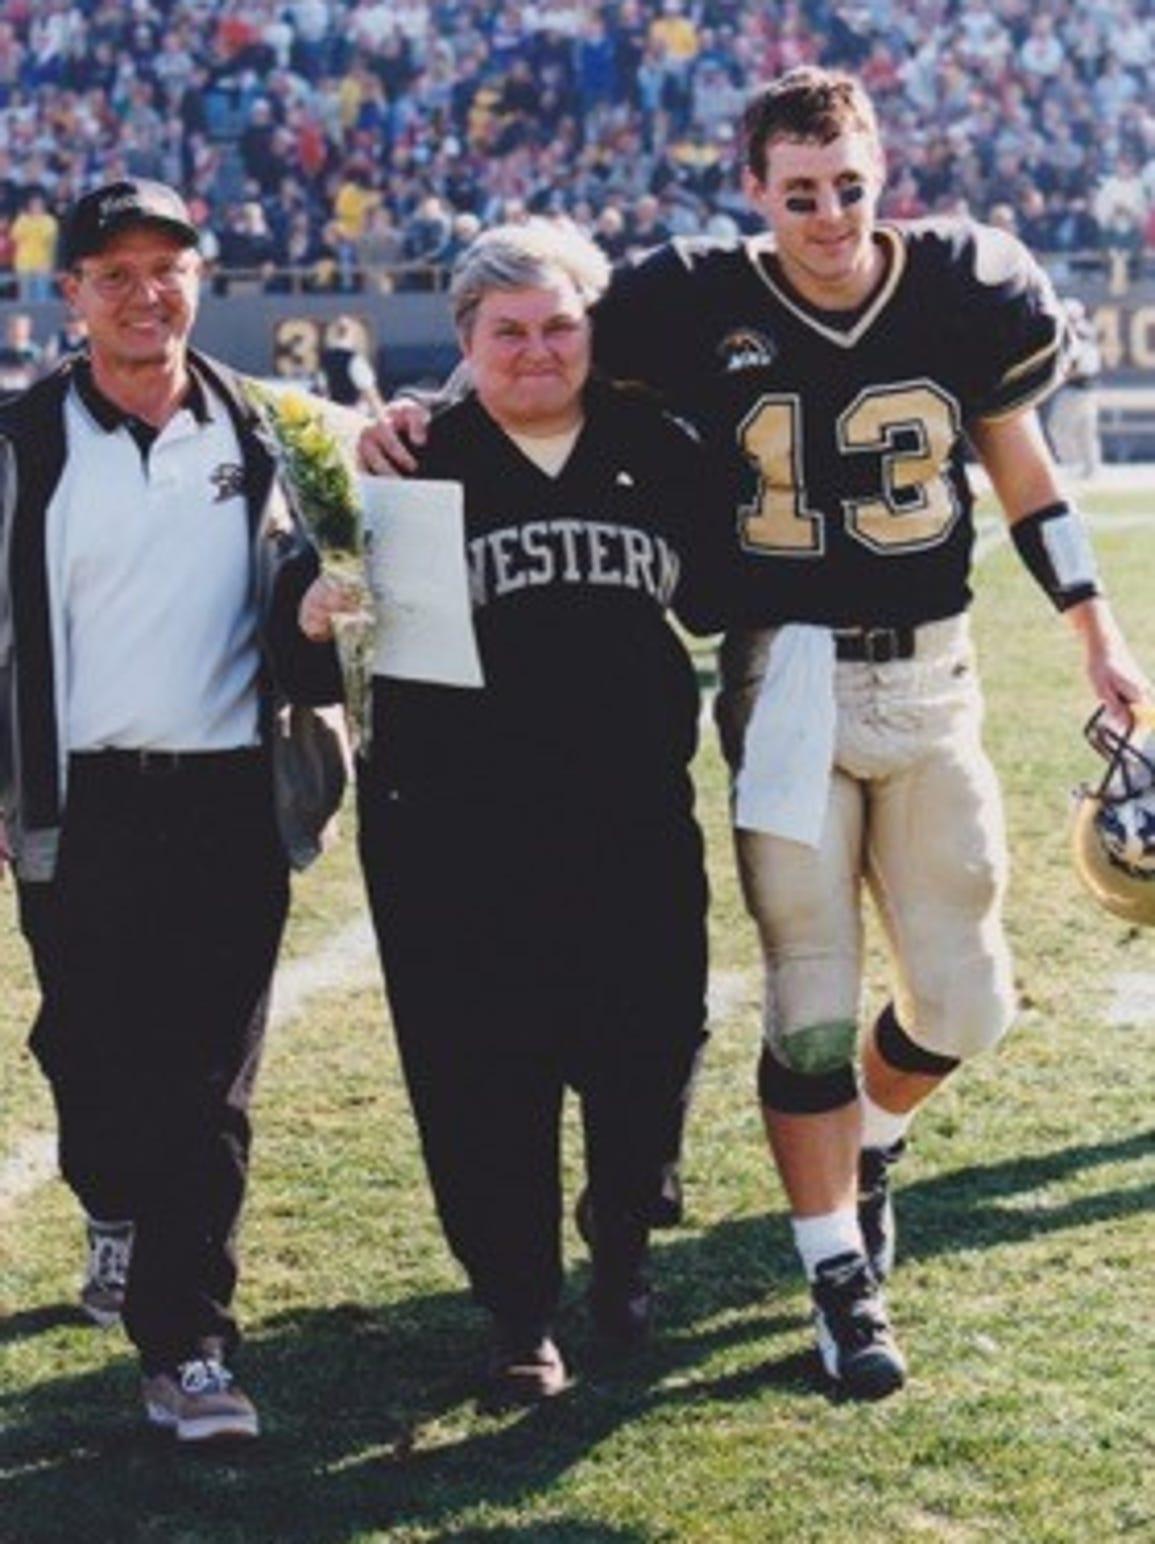 Tim Lester walks off the field at Waldo Stadium with